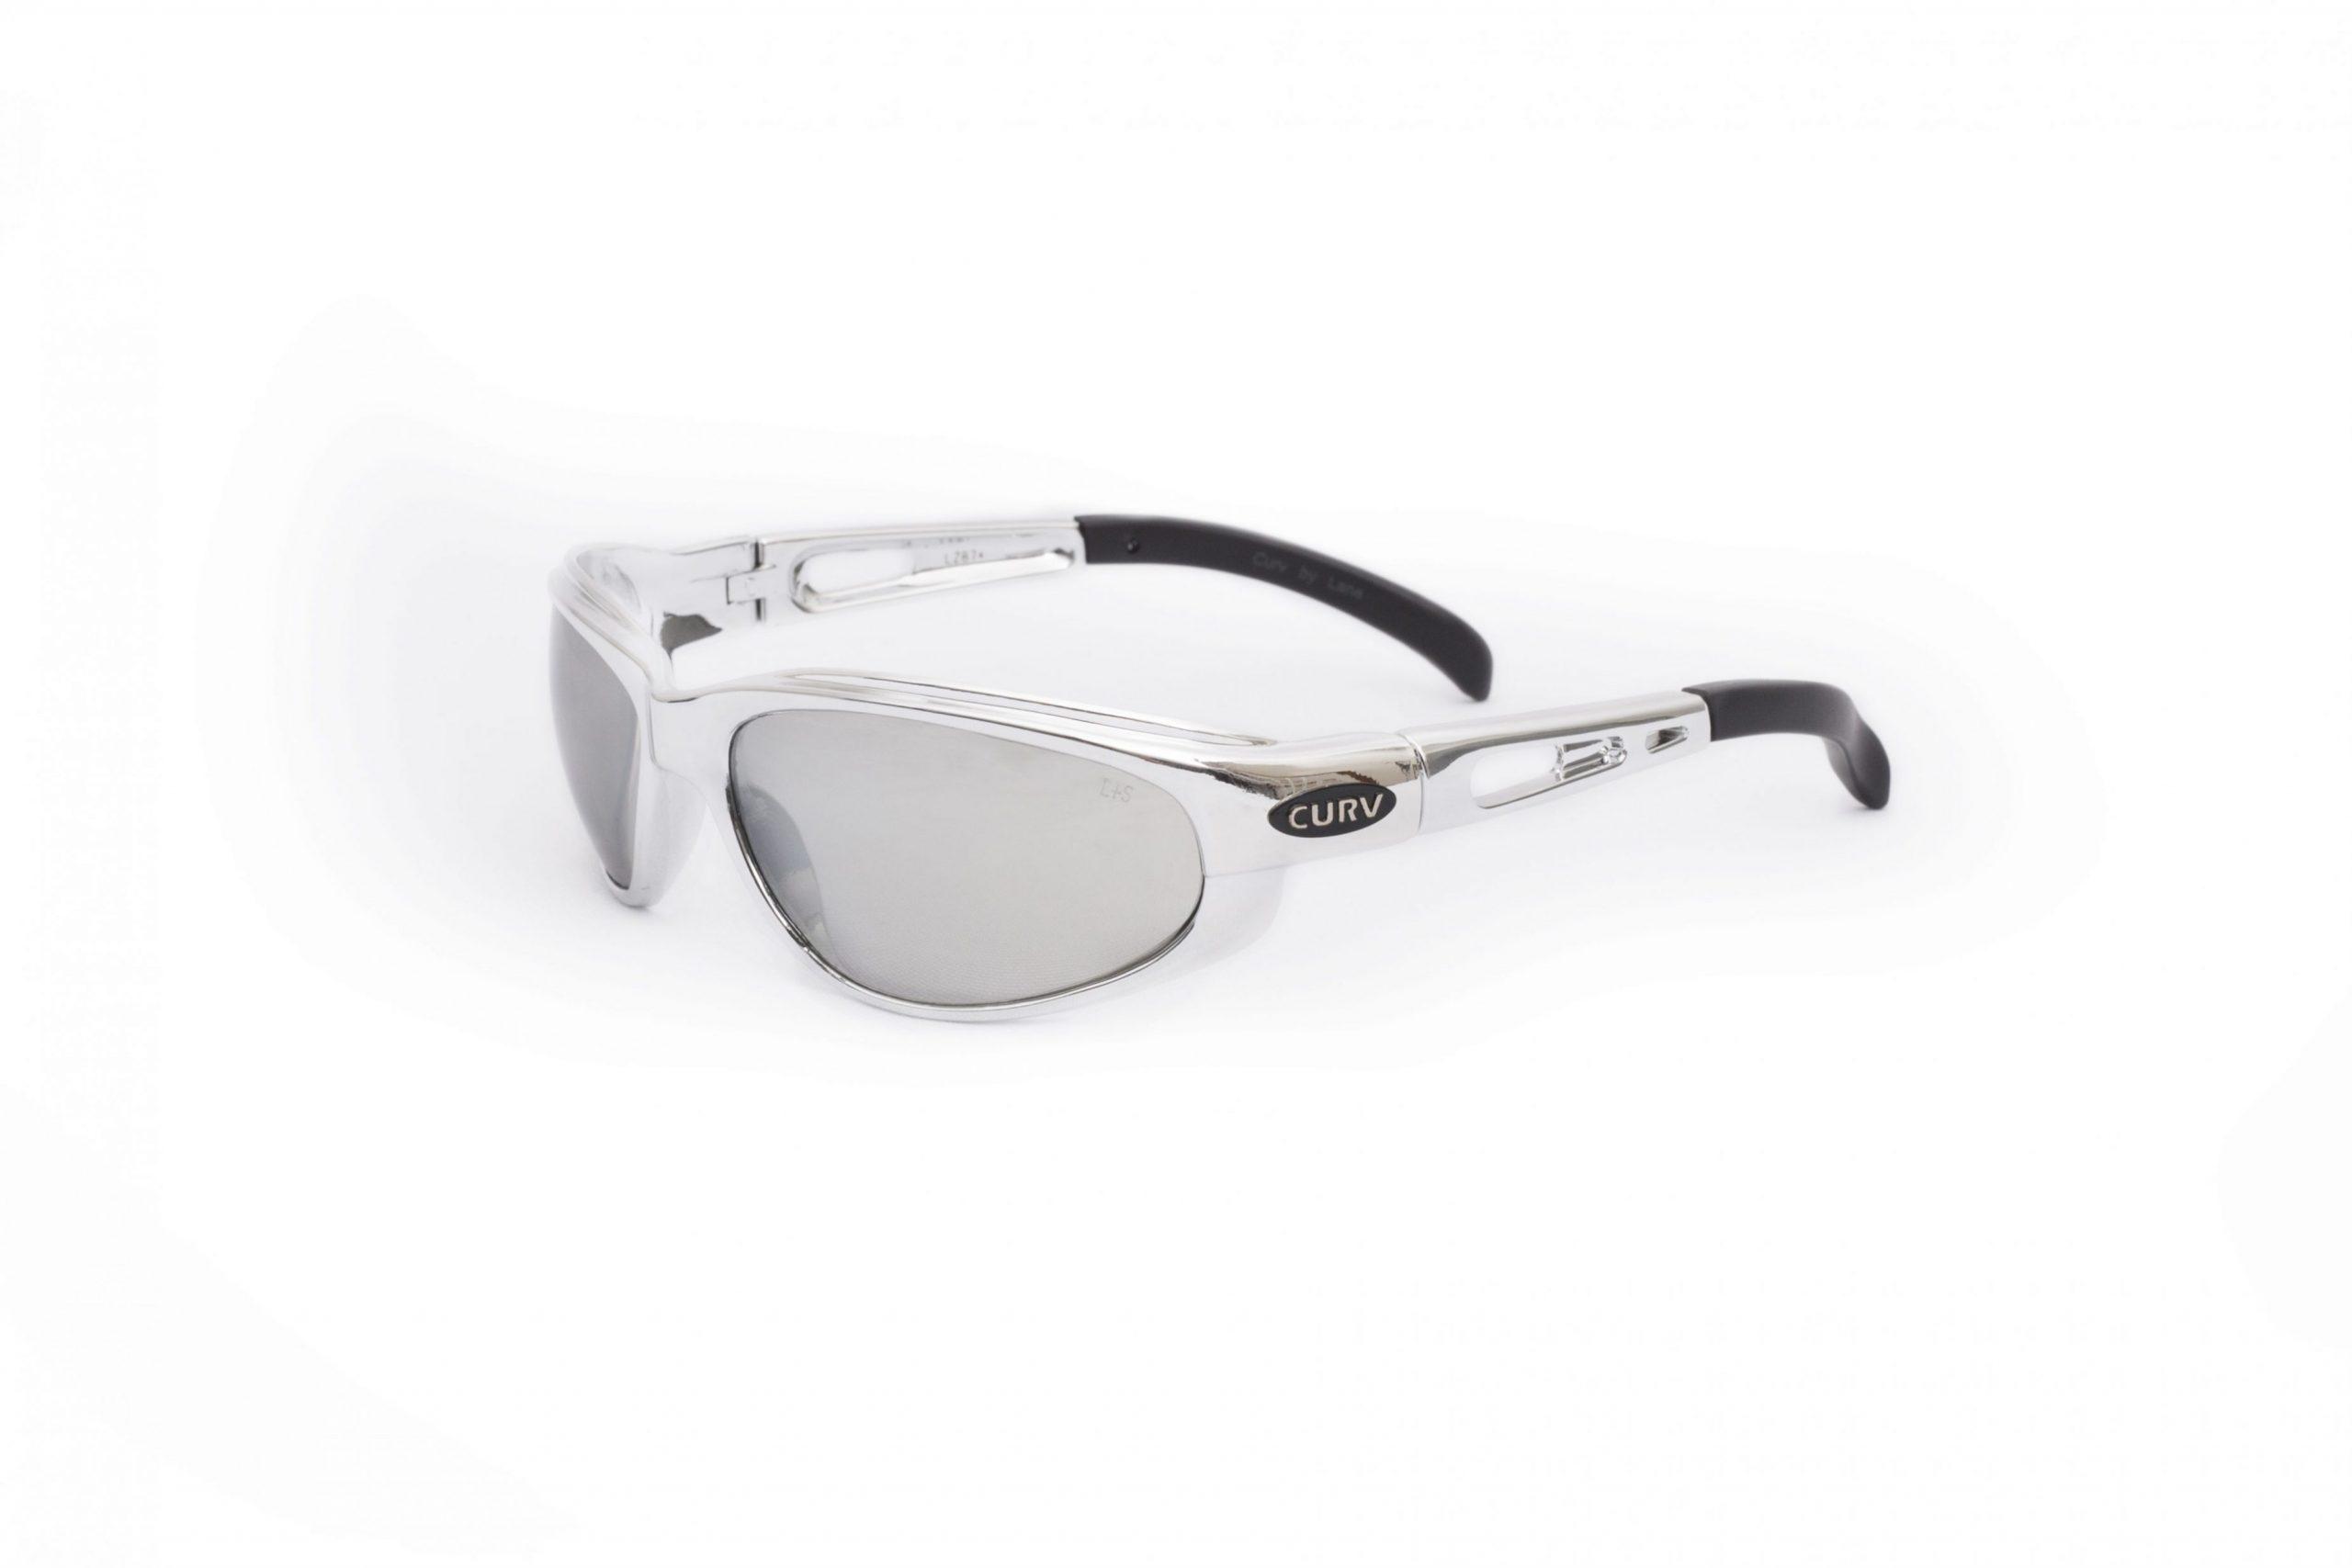 01-22 - Curv Silver Chrome Sunglasses with Smoke Mirror Lenses